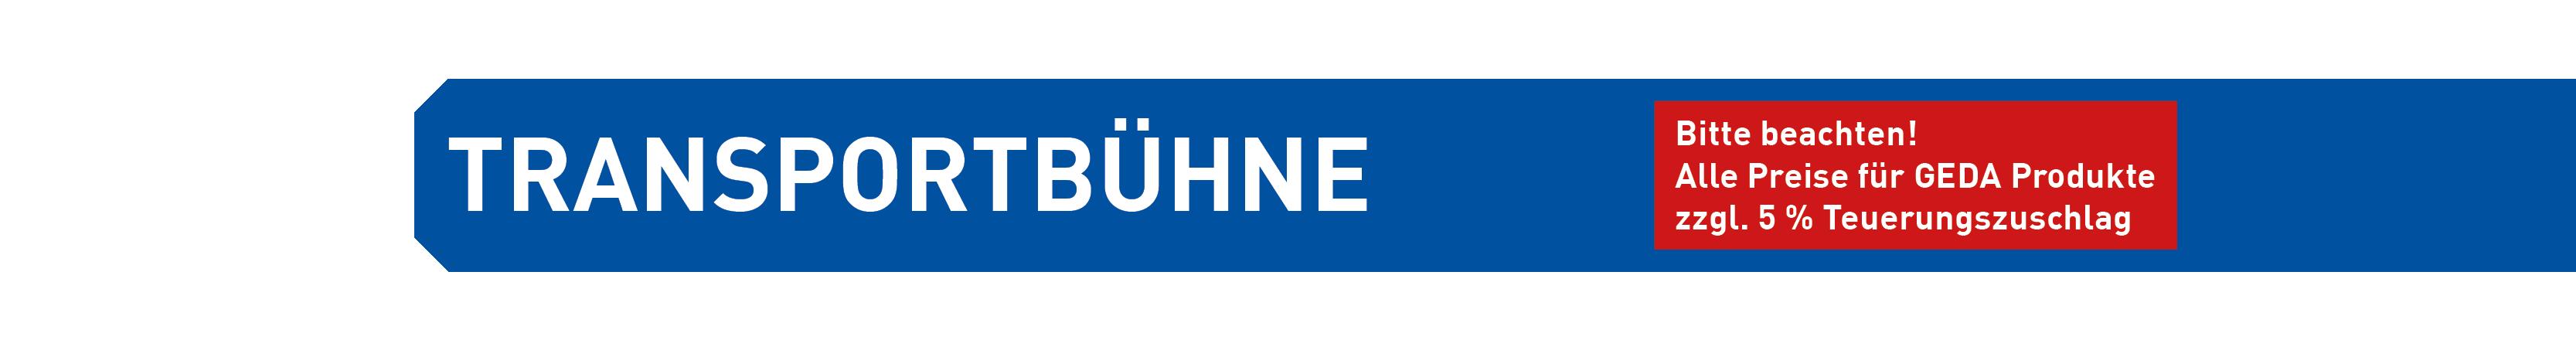 TRANSPORTBUEHNE_